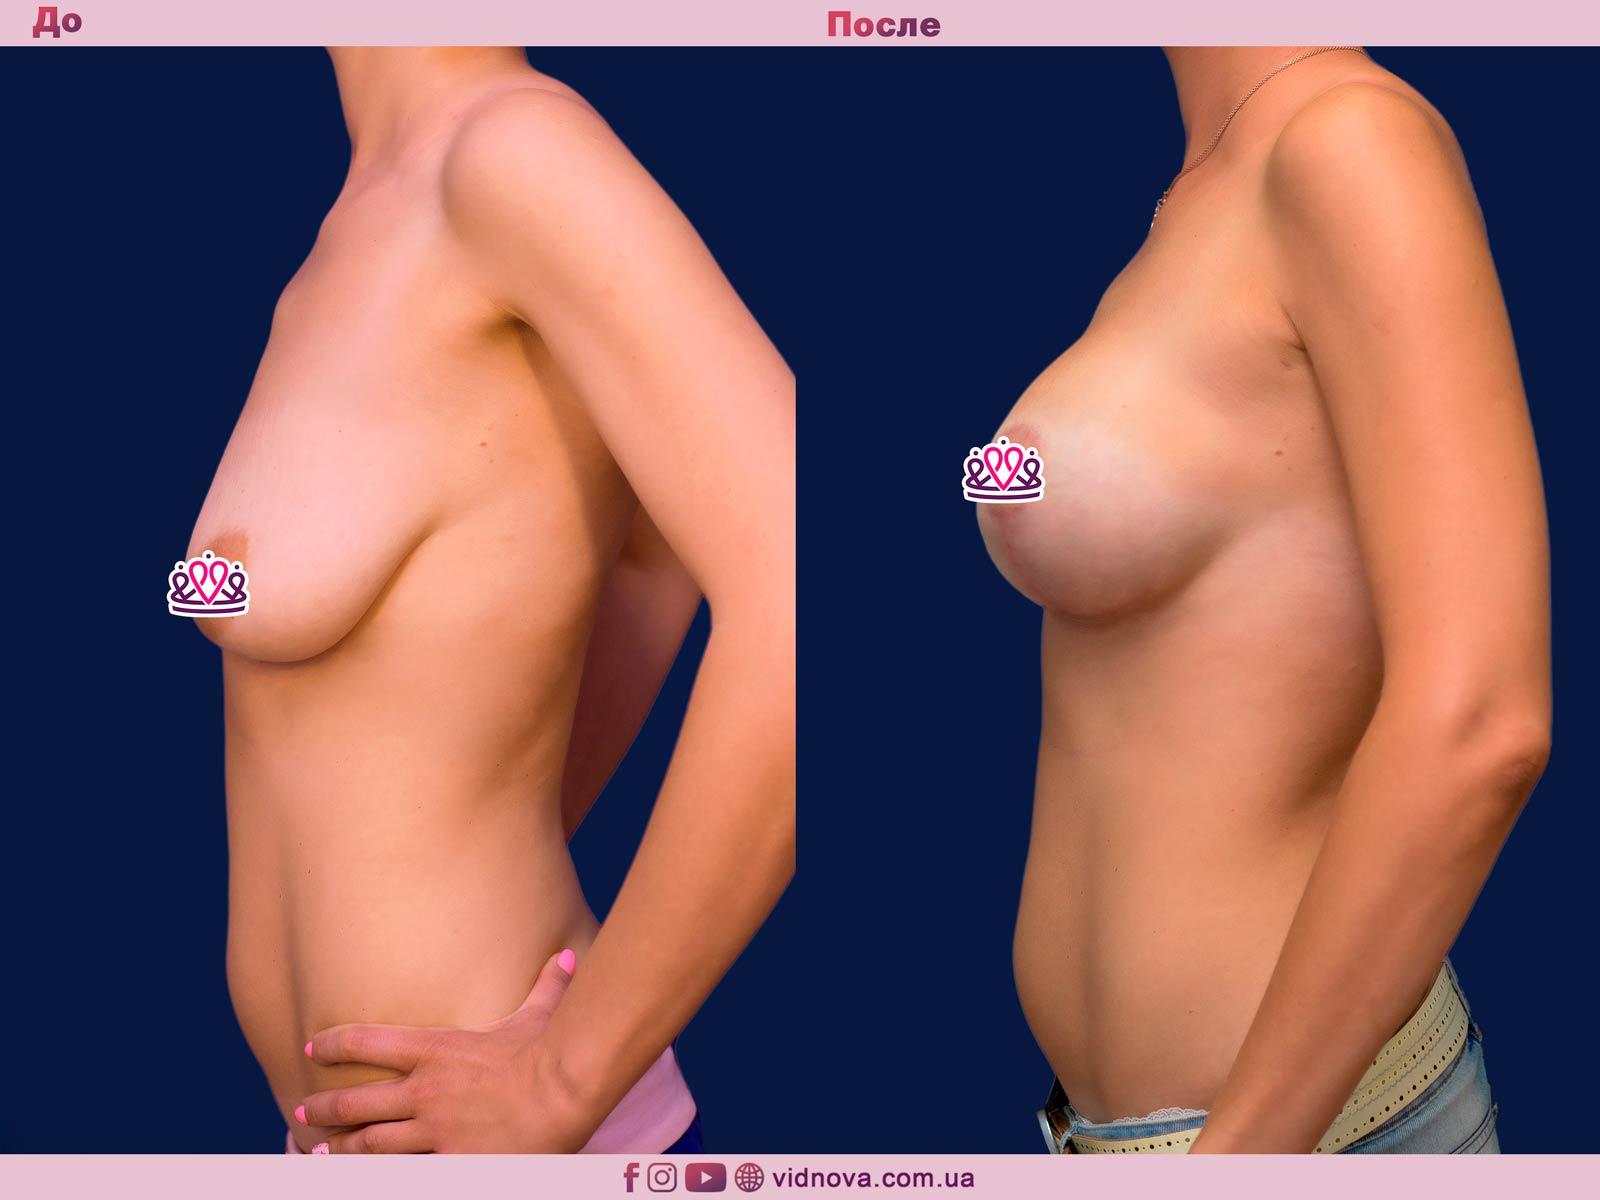 Подтяжка груди: Фото ДО и ПОСЛЕ - Пример №25-3 - Клиника Vidnova